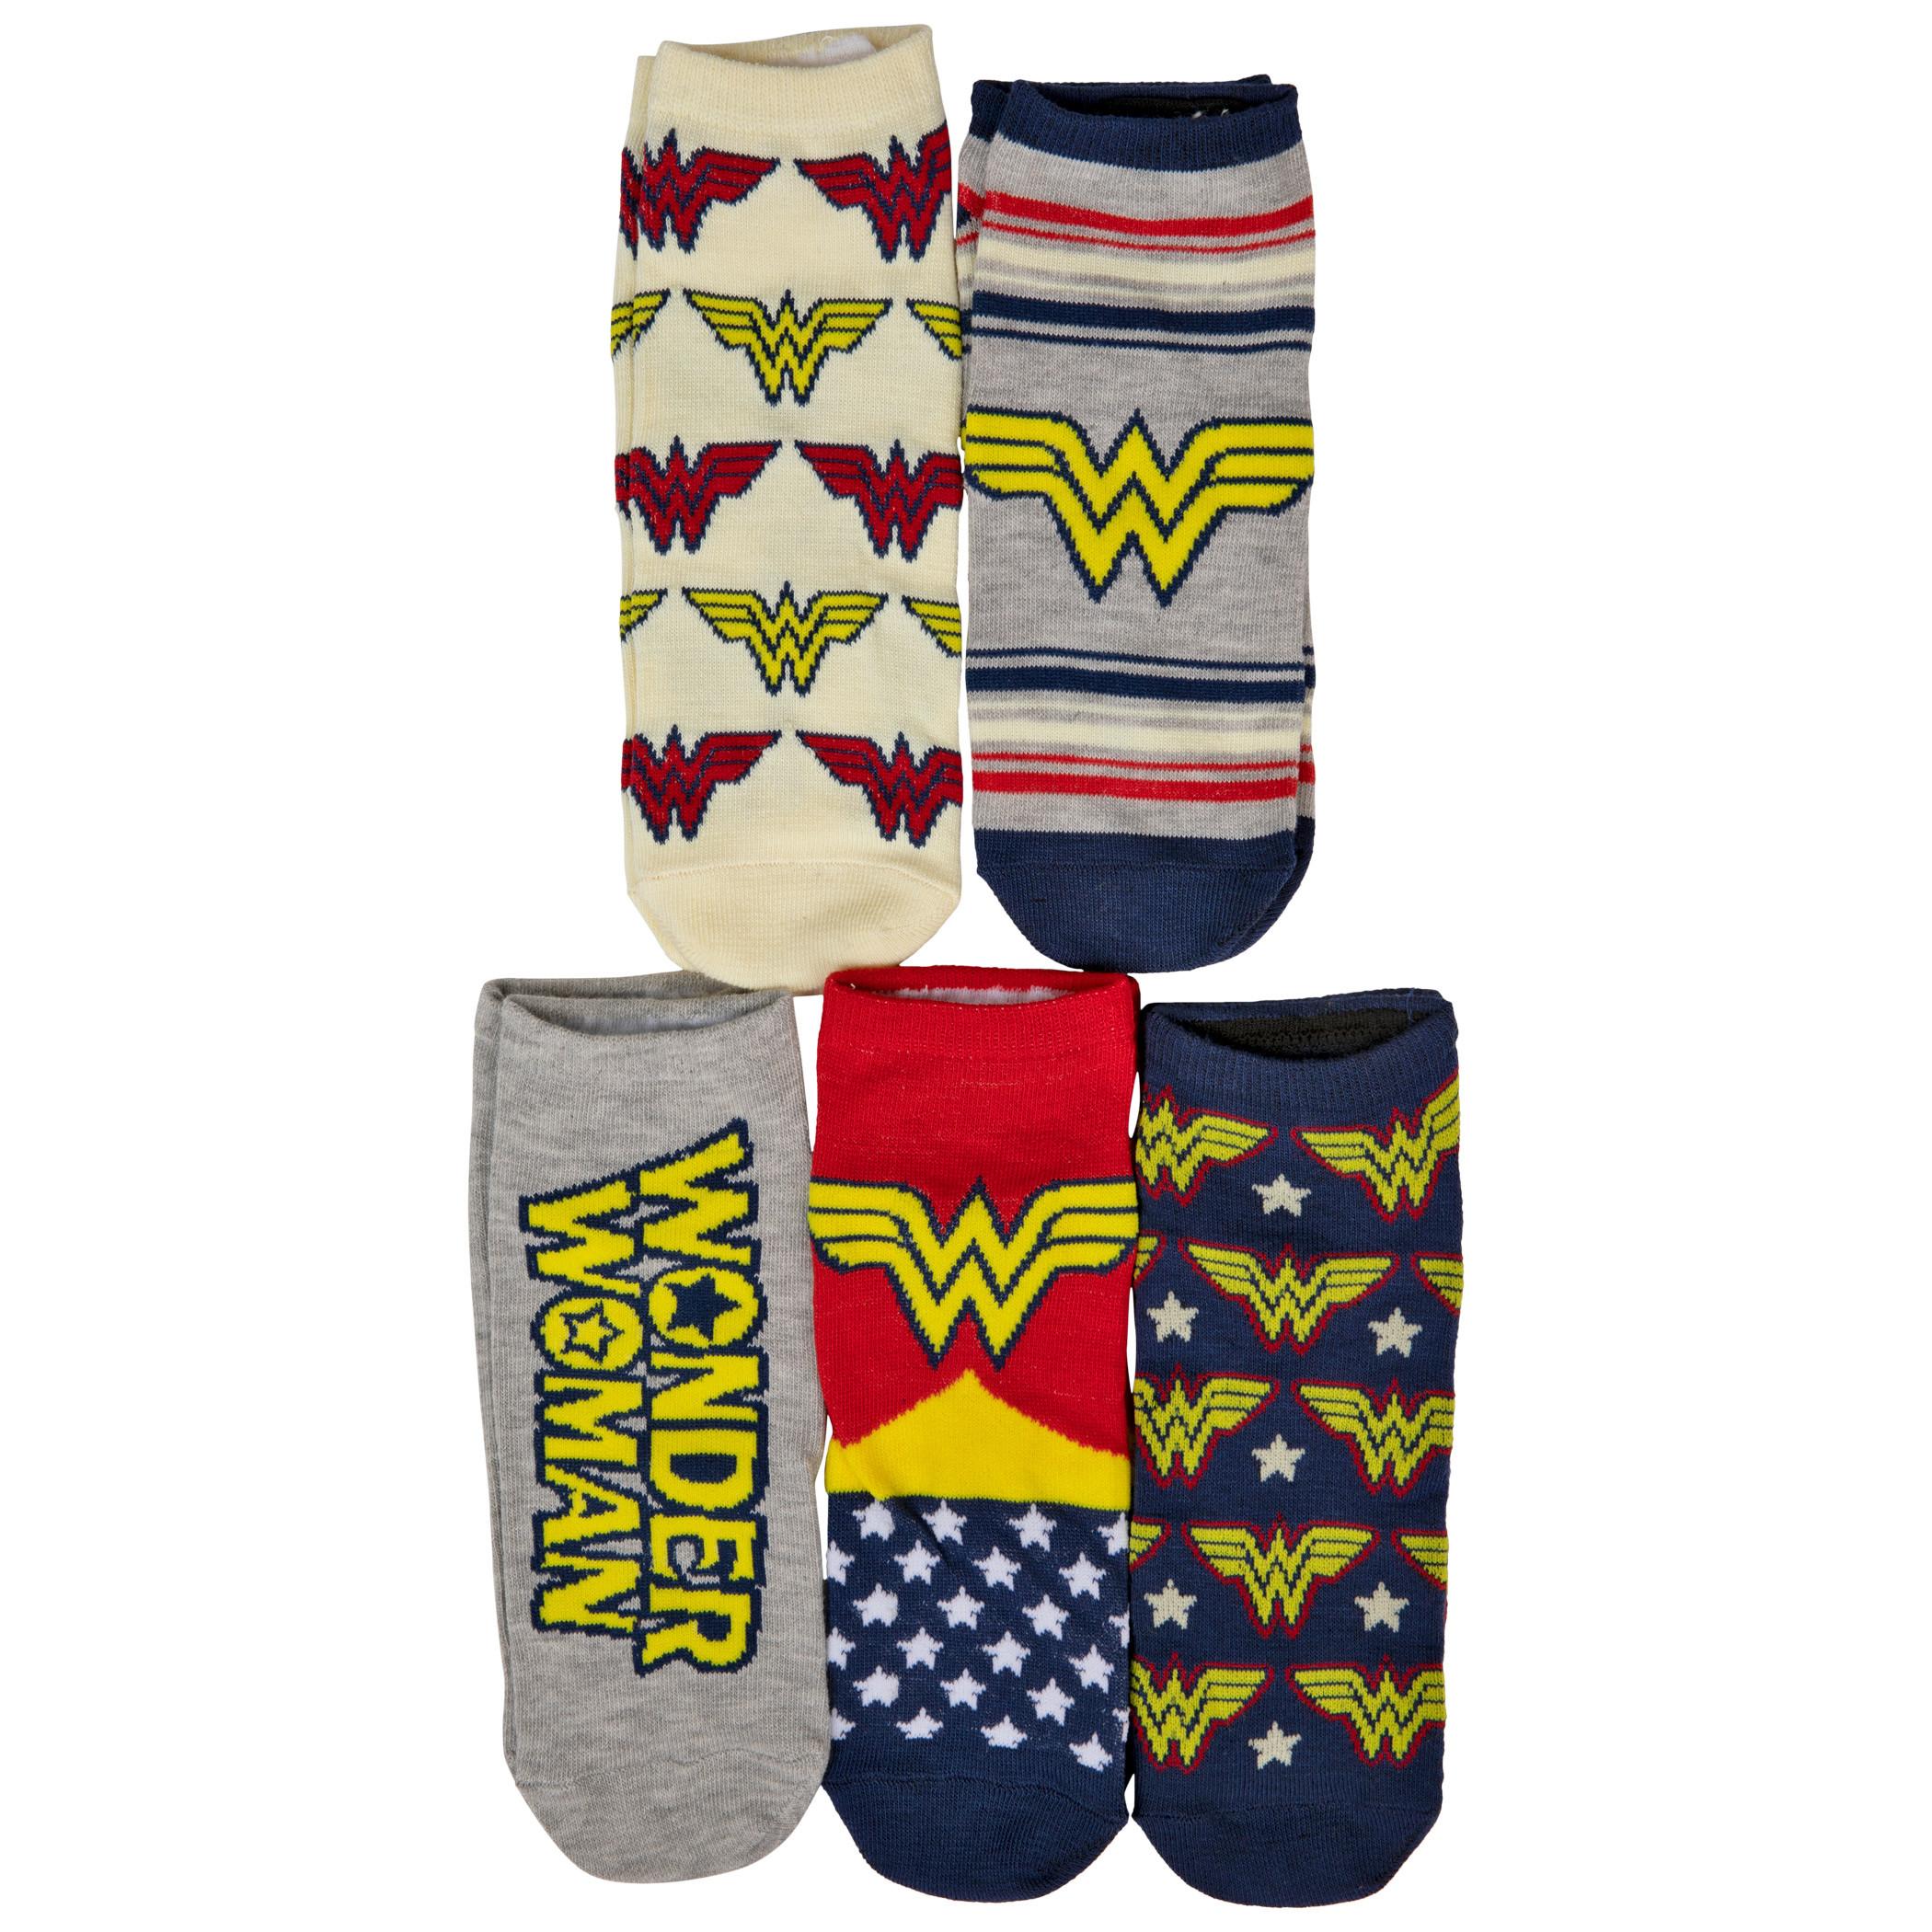 Wonder Woman Logos and Symbols Women's 5-Pack of Shorties Socks